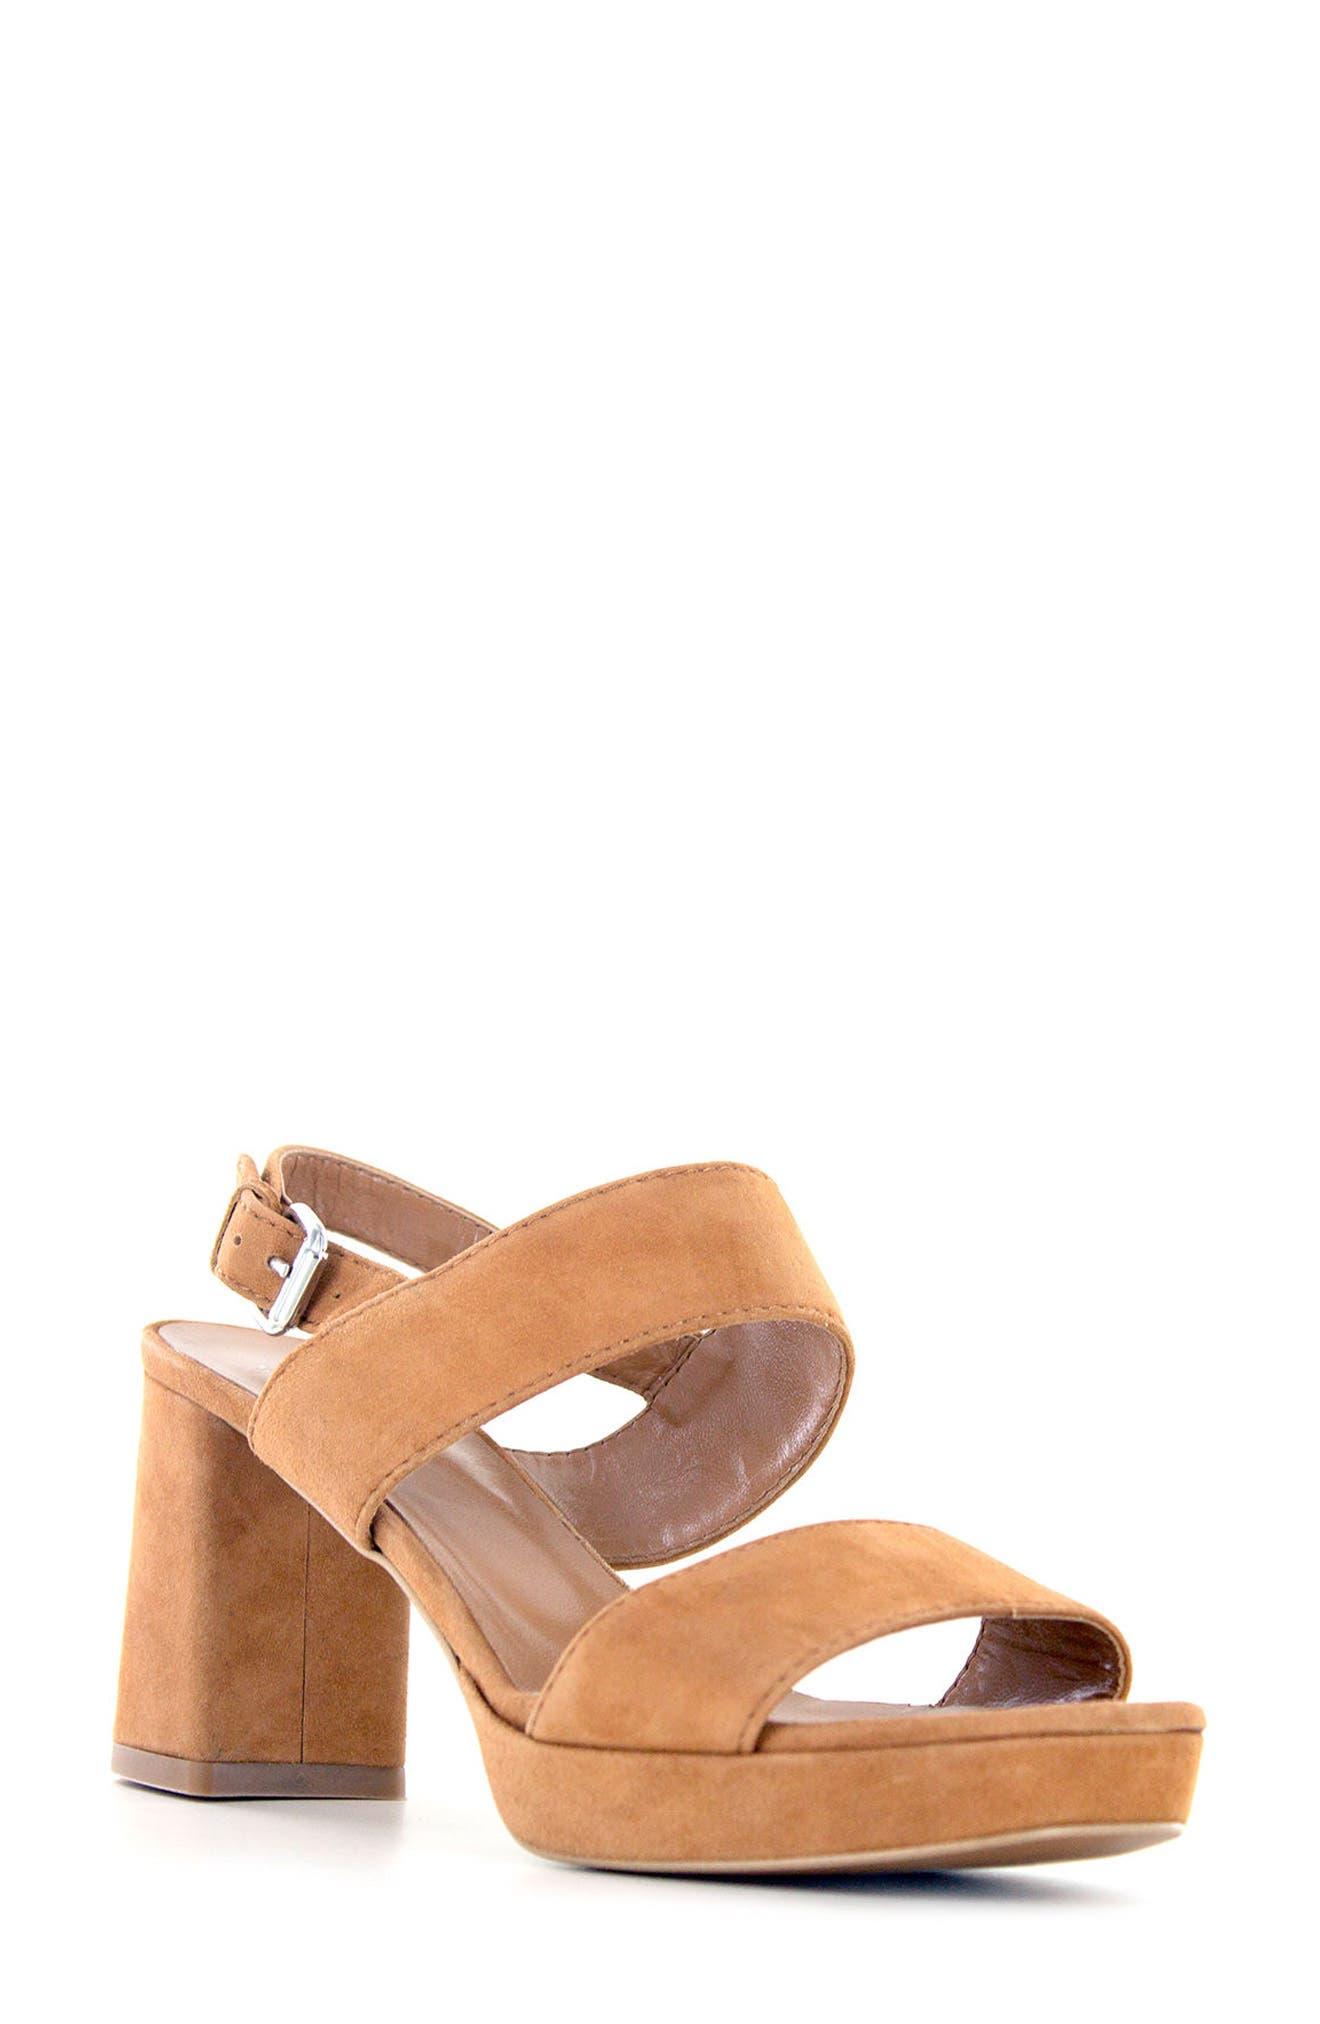 Summit Emilia Block Heel Sandal,                             Main thumbnail 3, color,